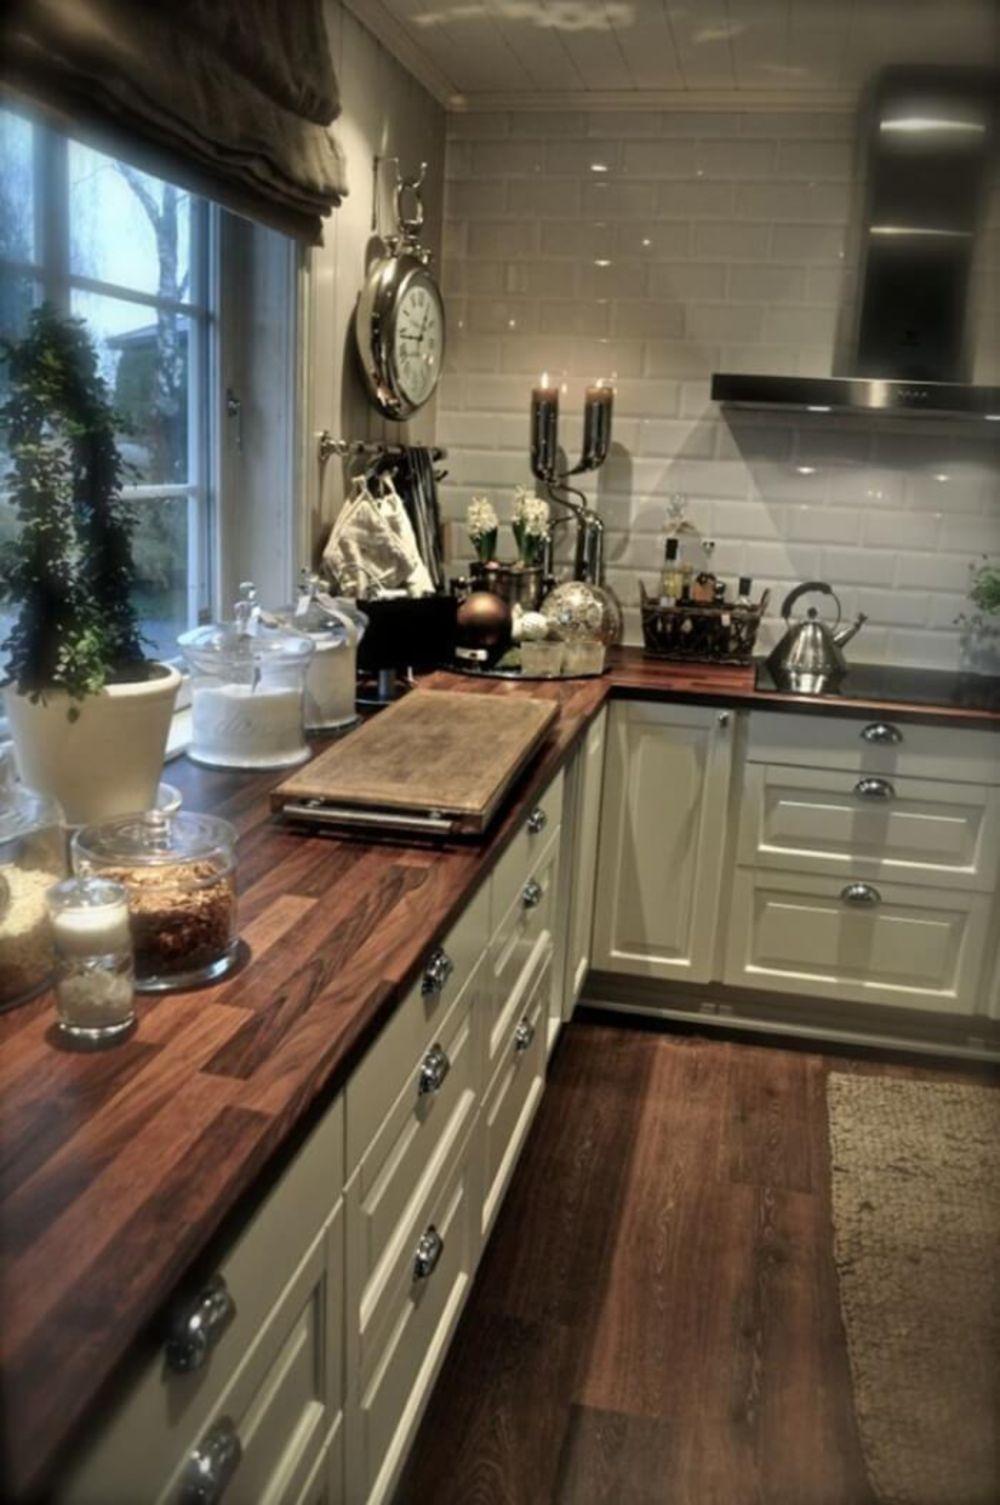 Modern Rustic Kitchen Cabinets 44 brilliant modern rustic kitchen decor ideas | modern rustic